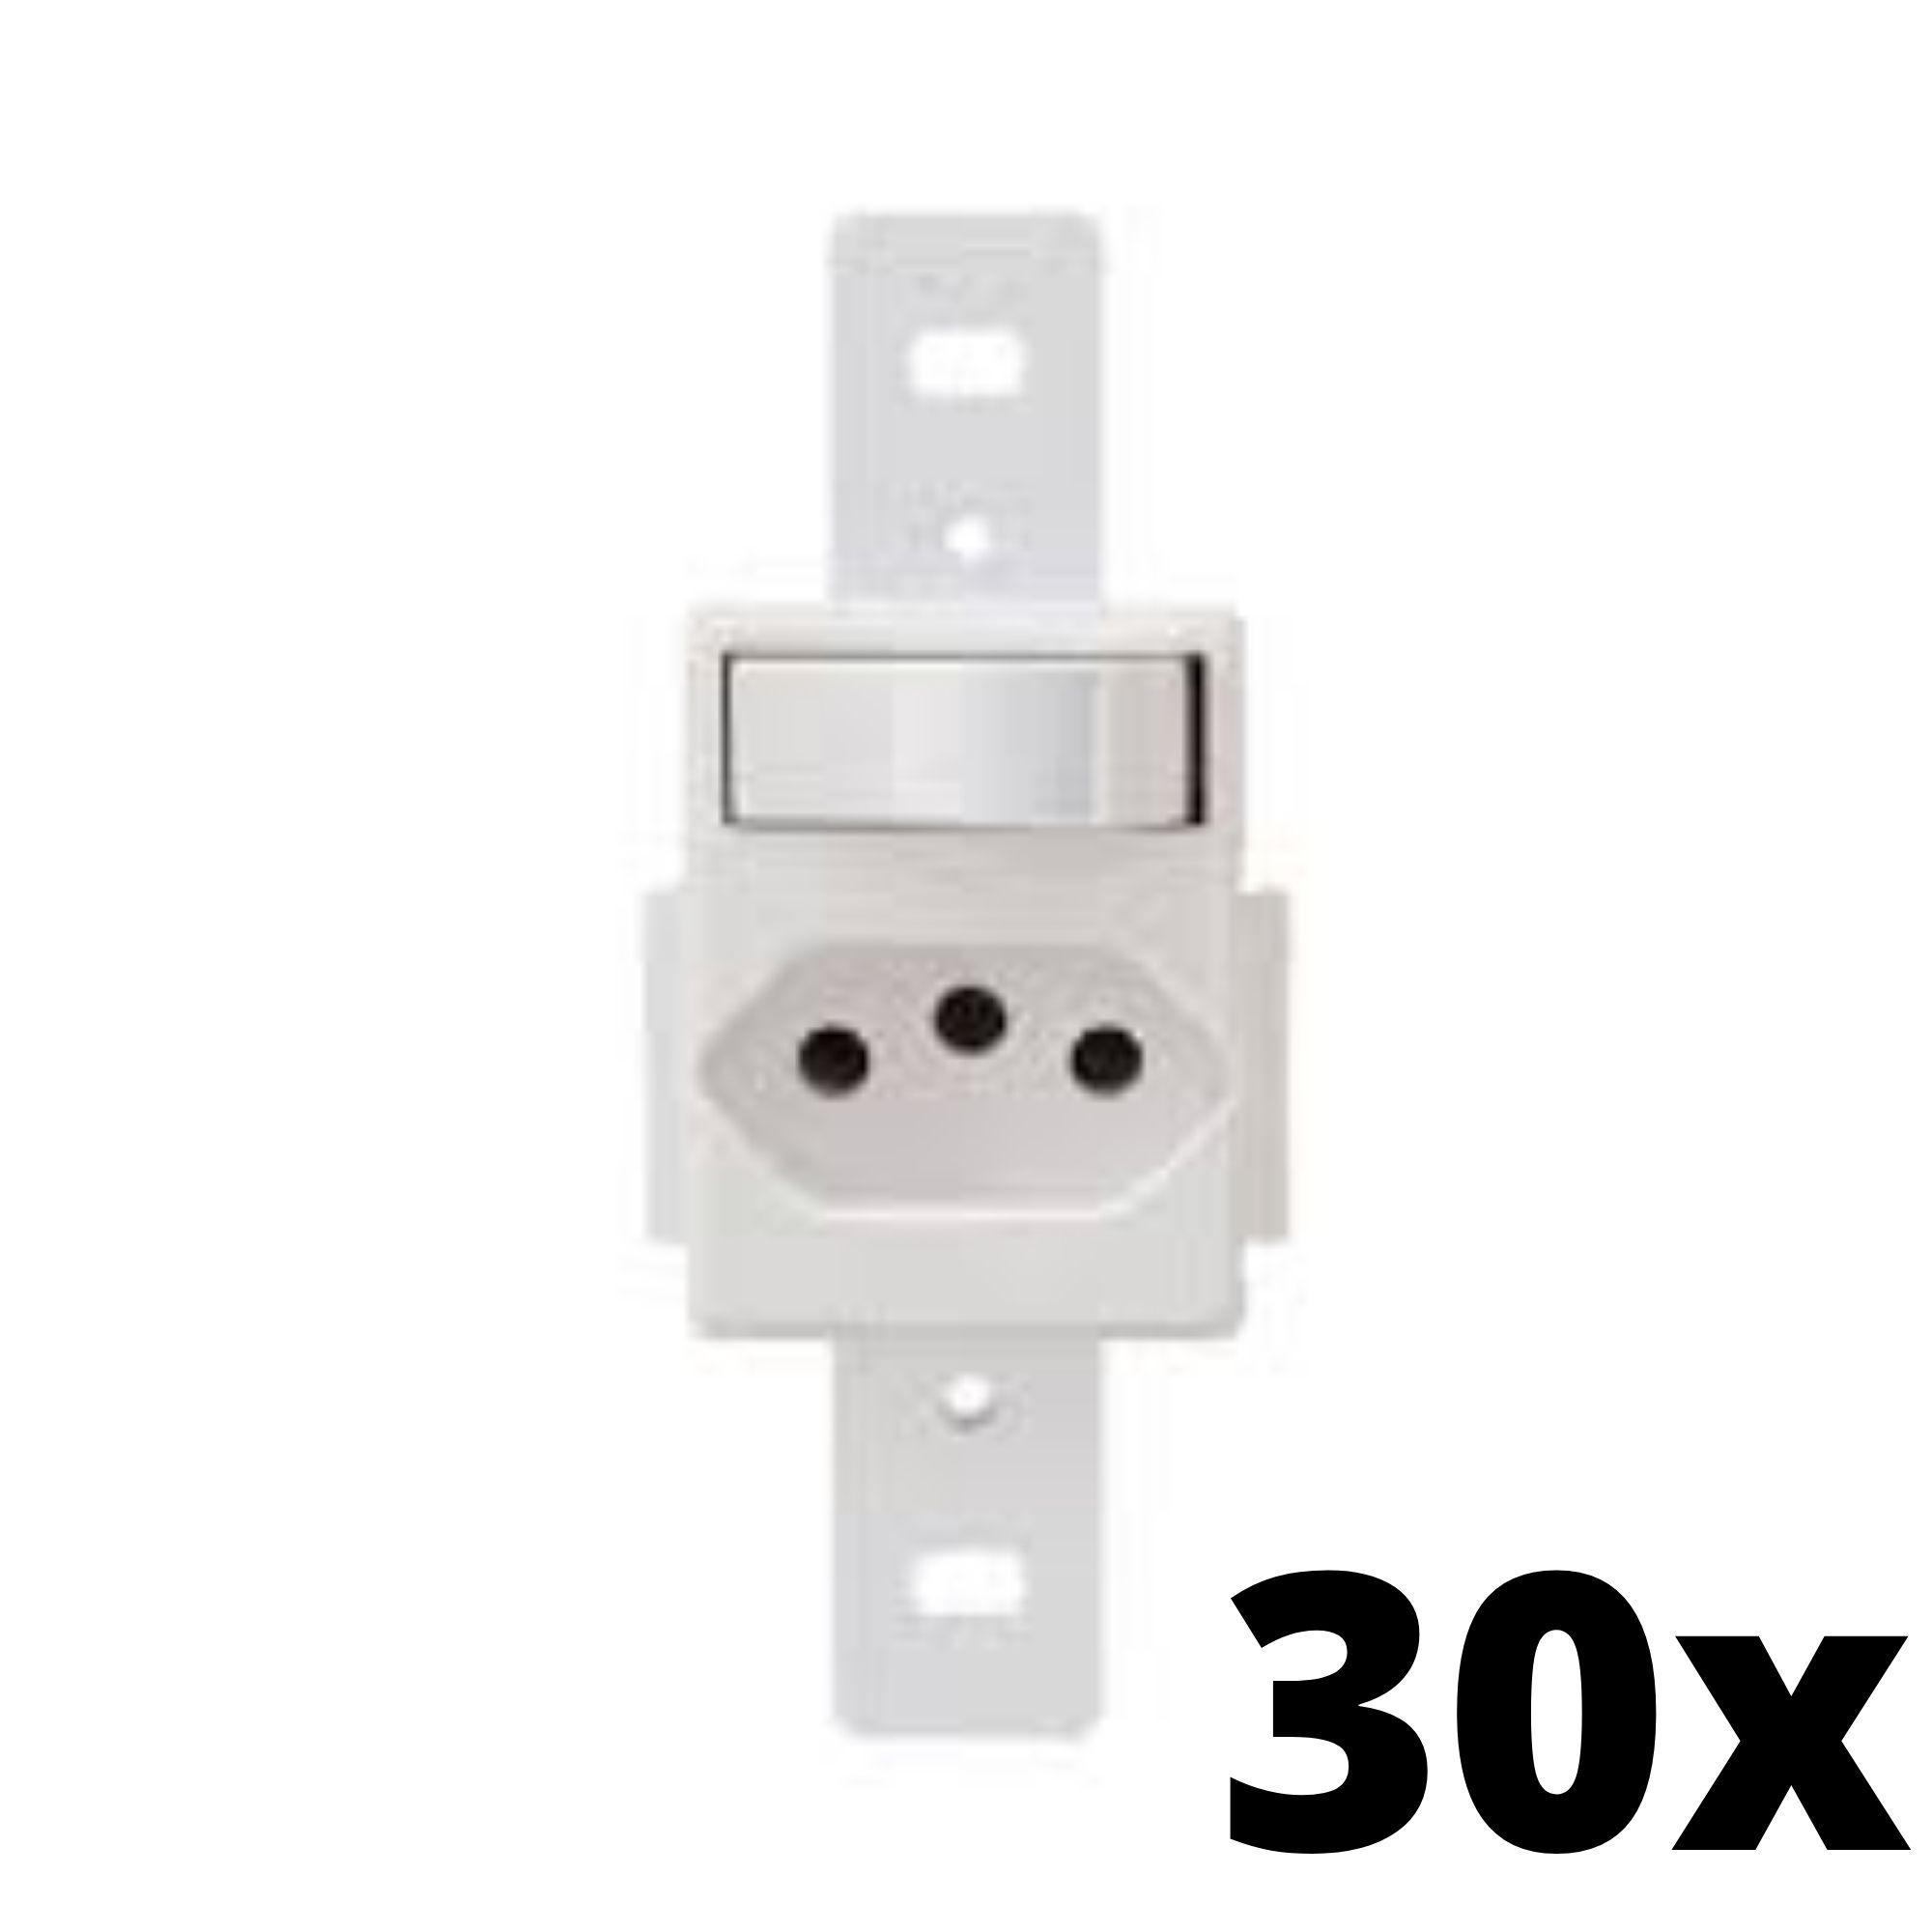 Kit 30 und  Blanc 1Seção Interruptor Simples+1Seção Tomada 10A Sem Placa